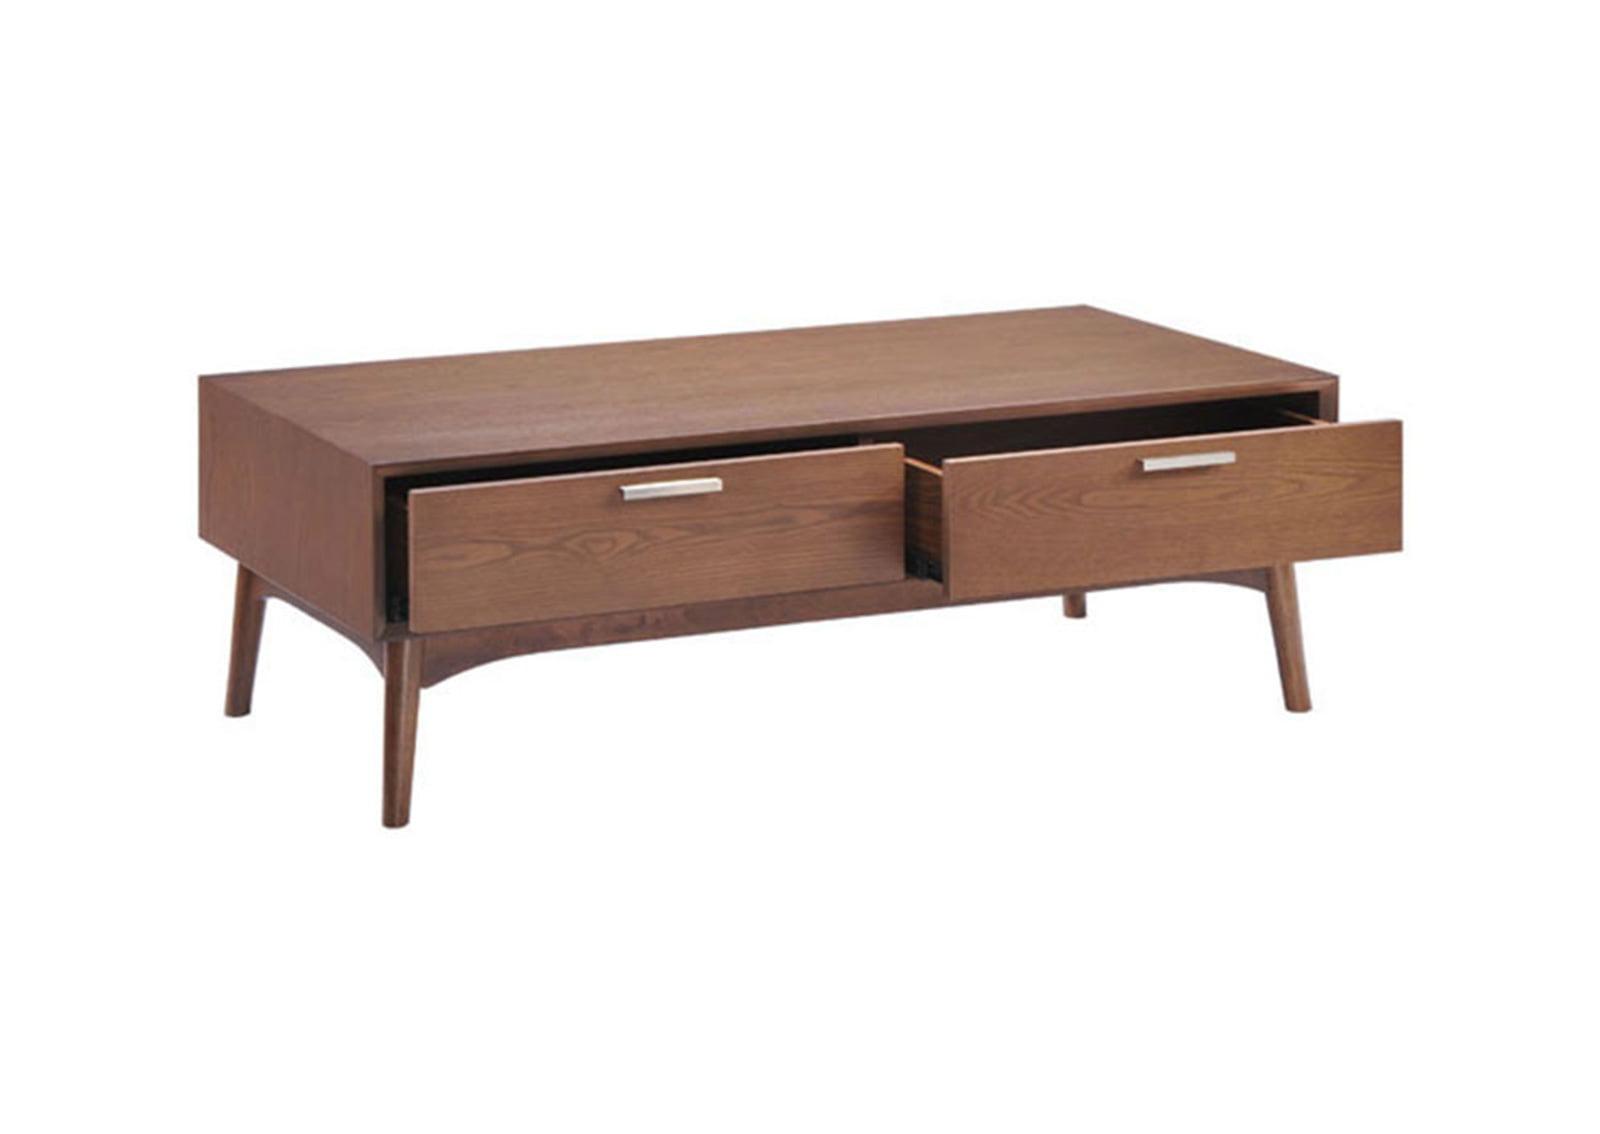 Design district coffee table walnut furnishplus for Walnut coffee table